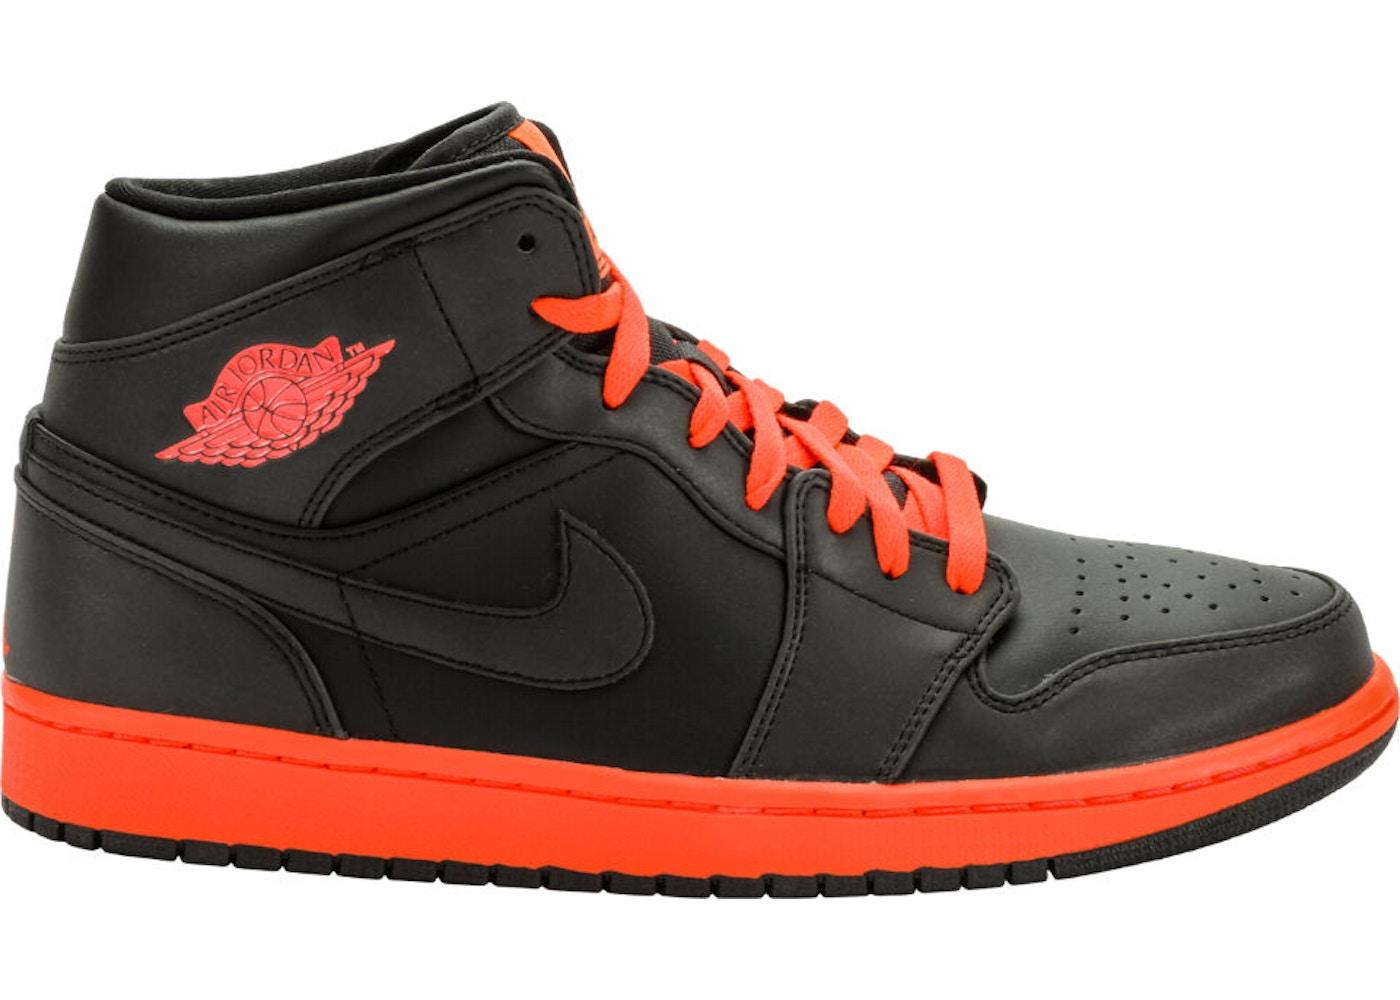 sneakers for cheap 6293b 21a8e Jordan 1 Retro Mid Black Infrared